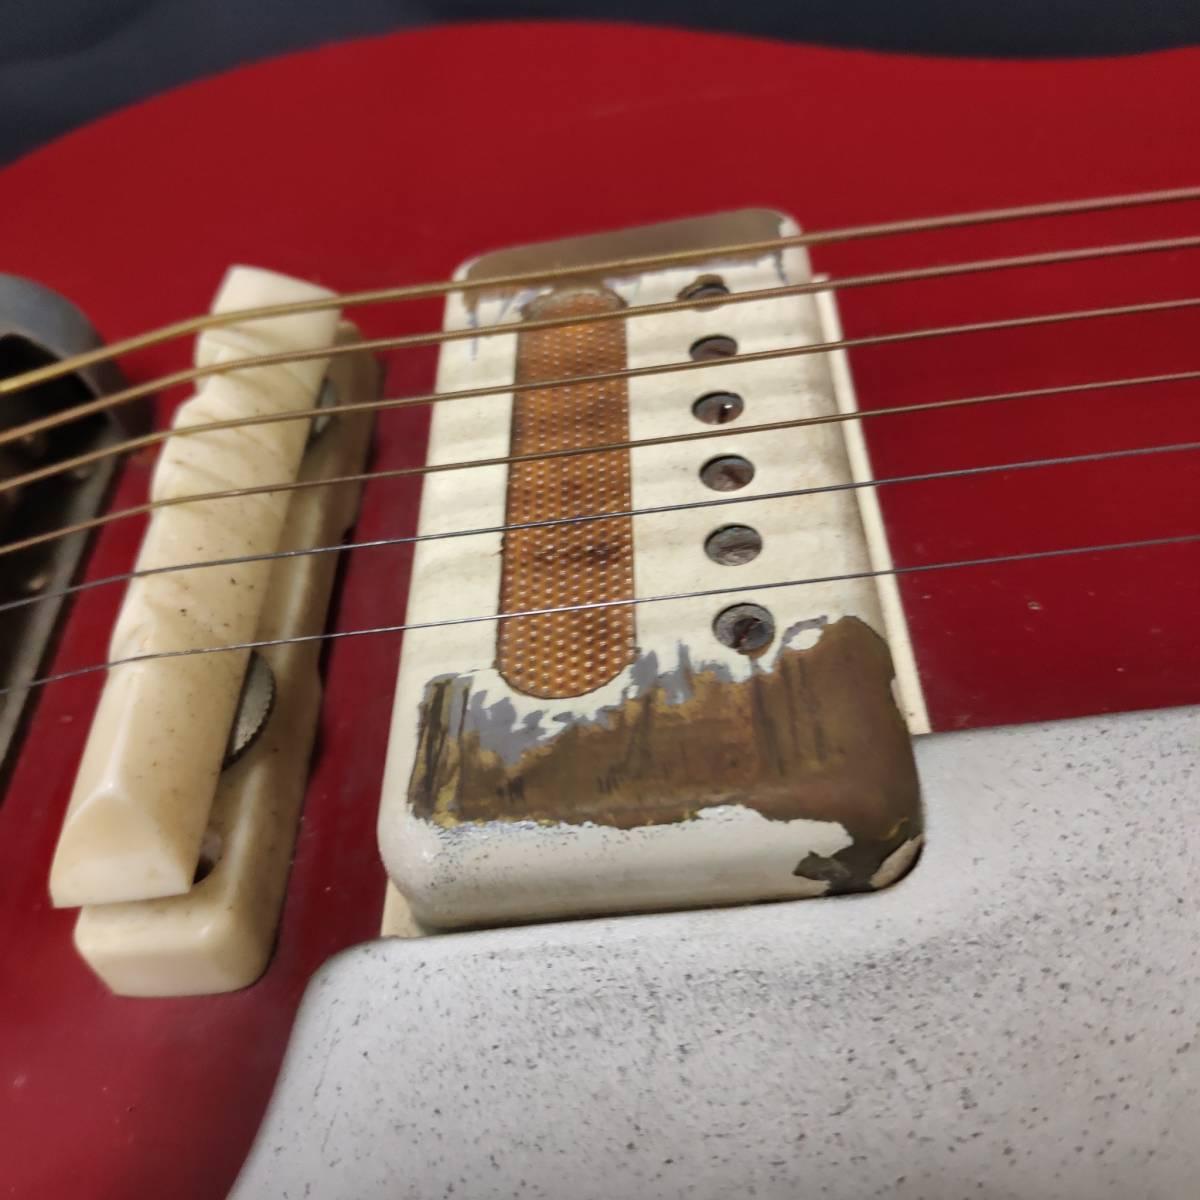 A22m11T GUYA TONE エレキギター LG-85T 本体 約100cm グヤトーン ビンテージ レッド 赤色_画像10